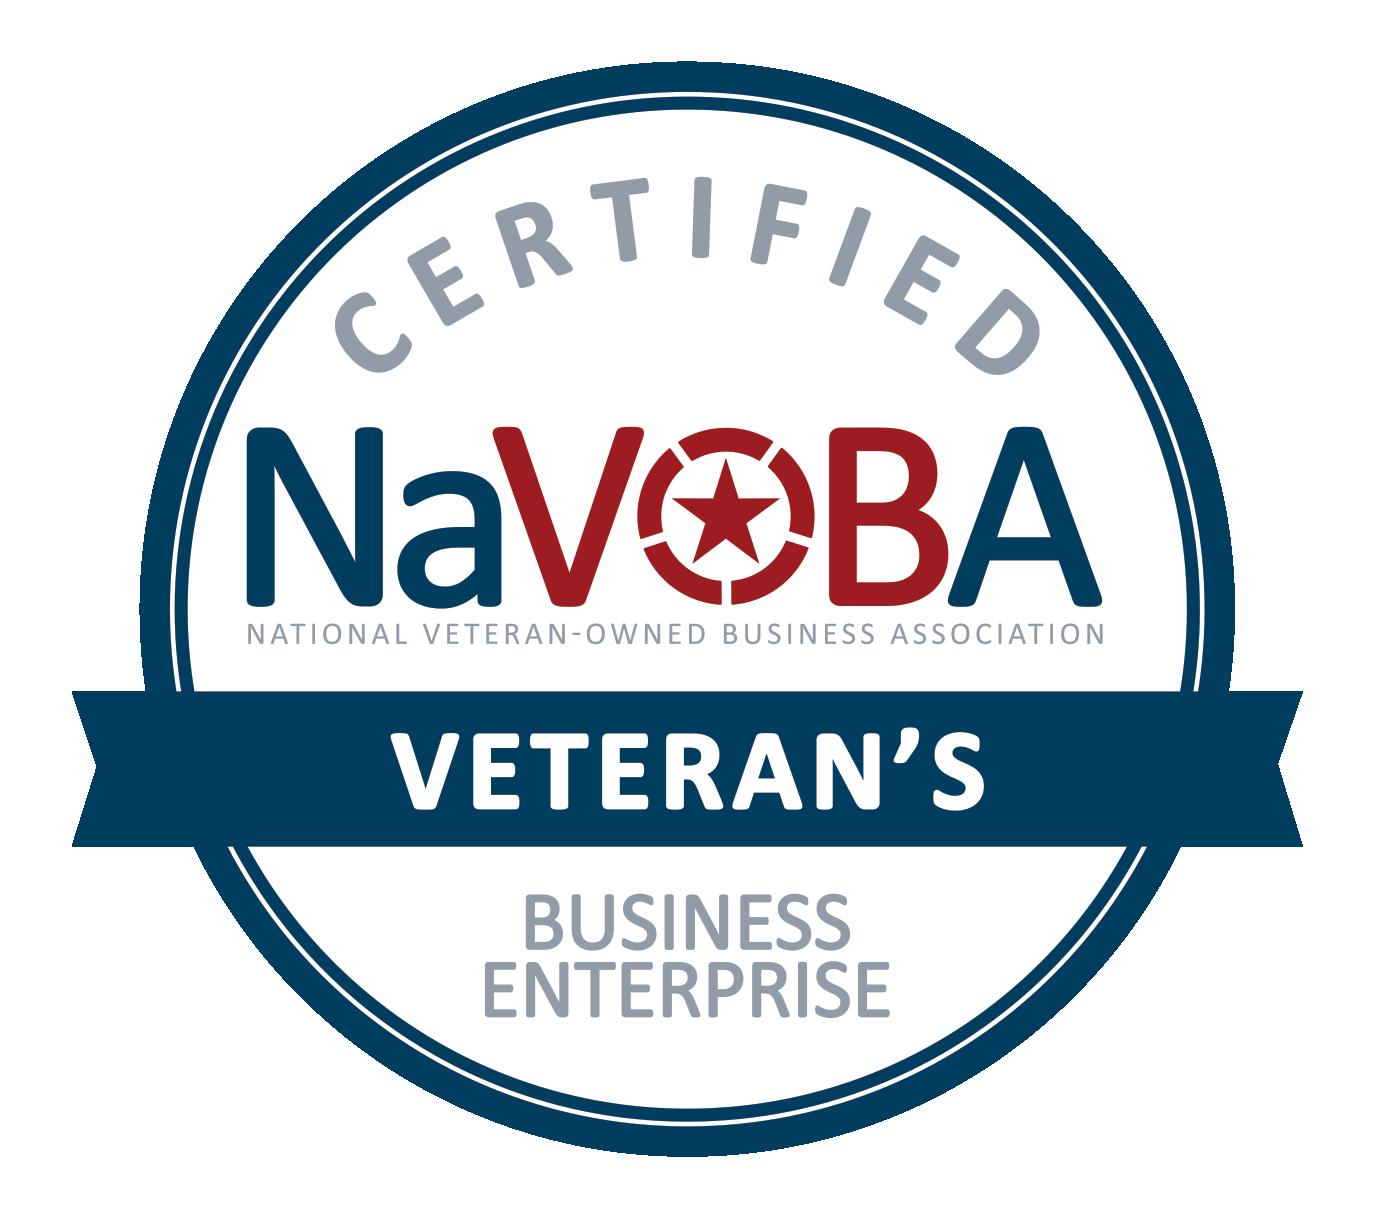 National Veteran-Owned Business Association